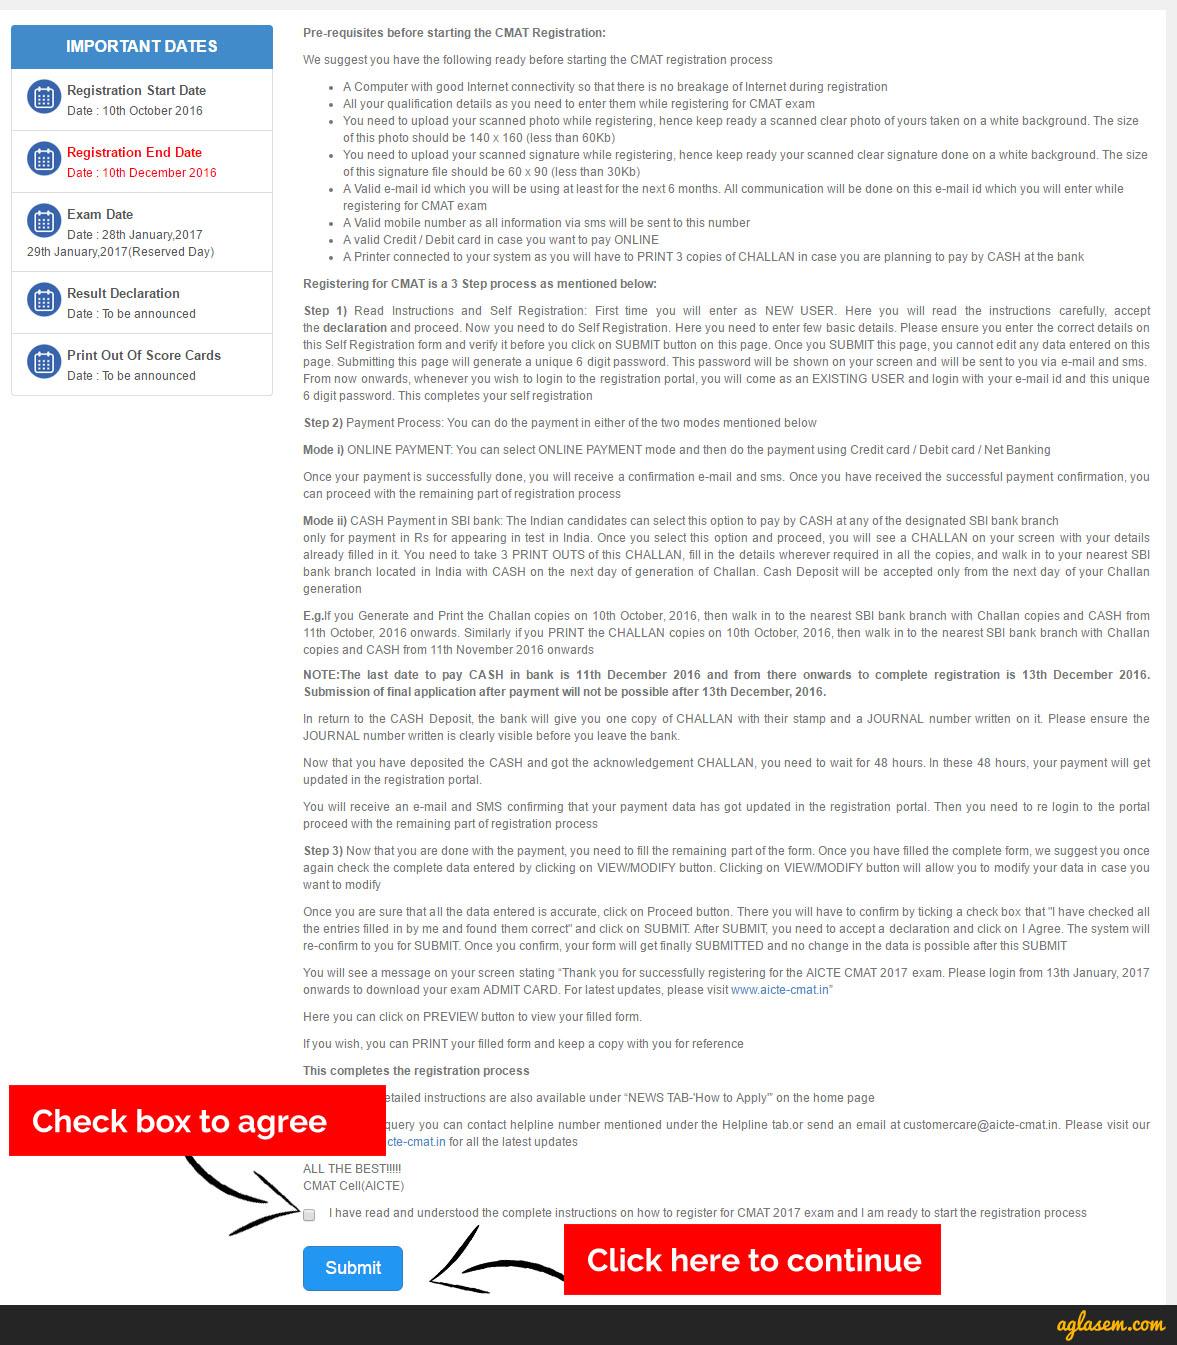 CMAT Application Form 2017